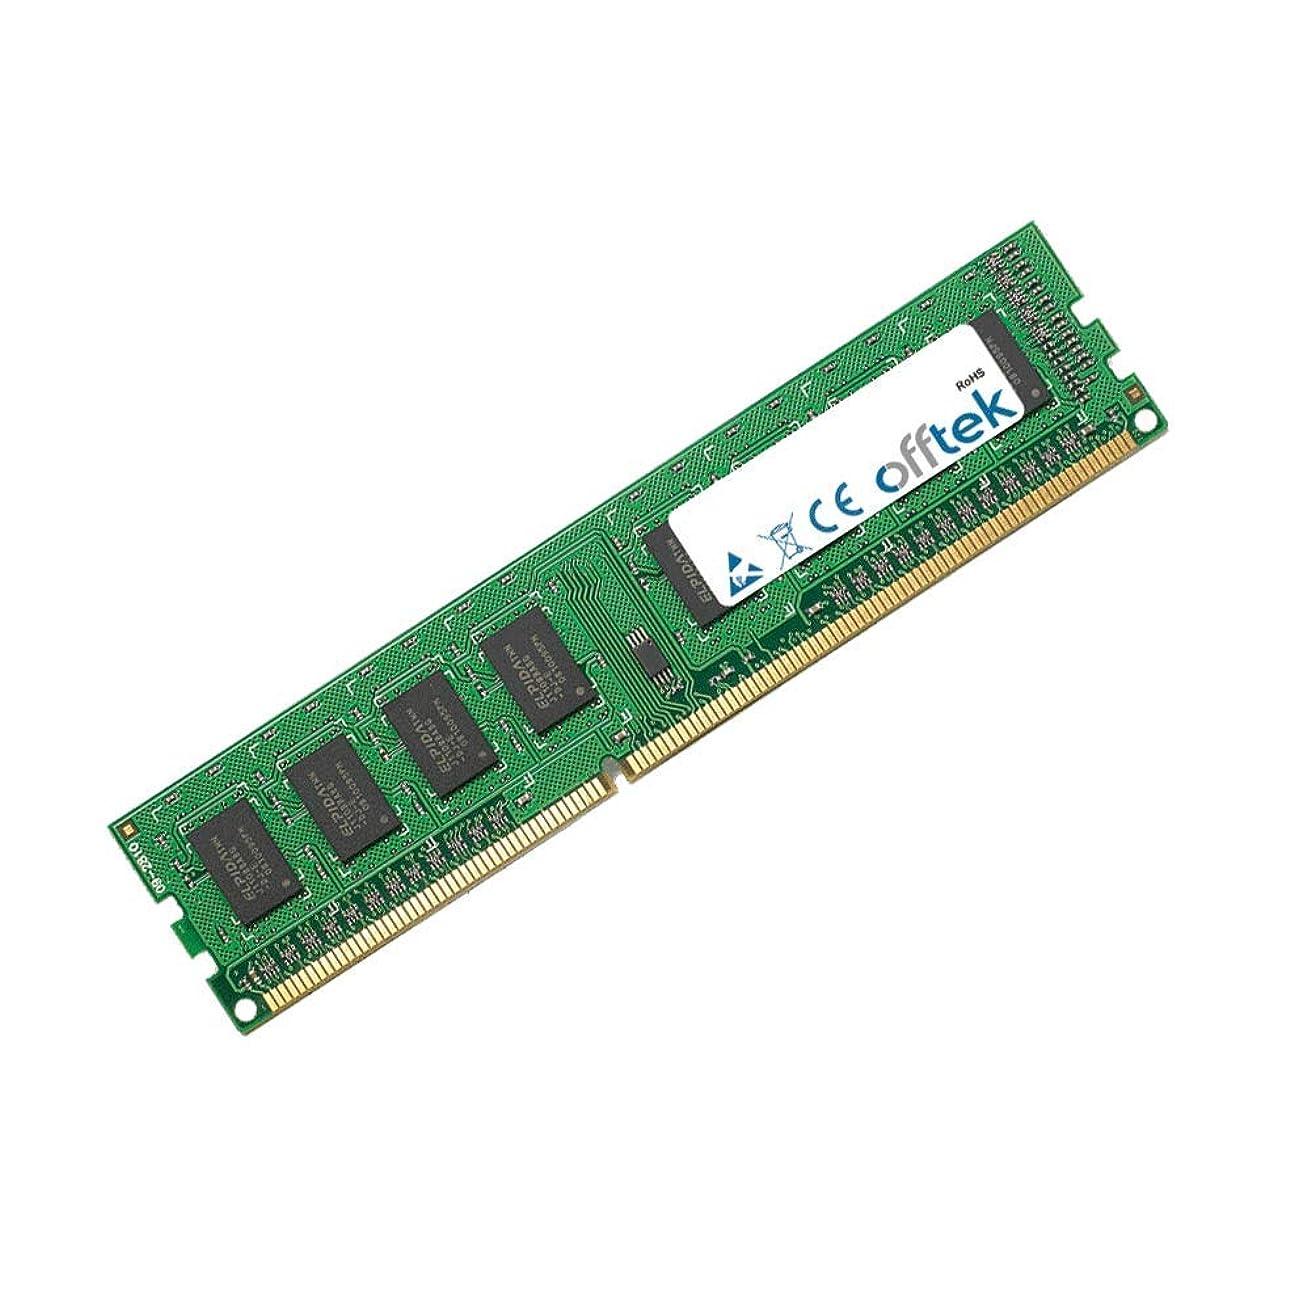 2GB RAM Memory for Dell Inspiron 570 (DDR3-10600 - Non-ECC) - Desktop Memory Upgrade